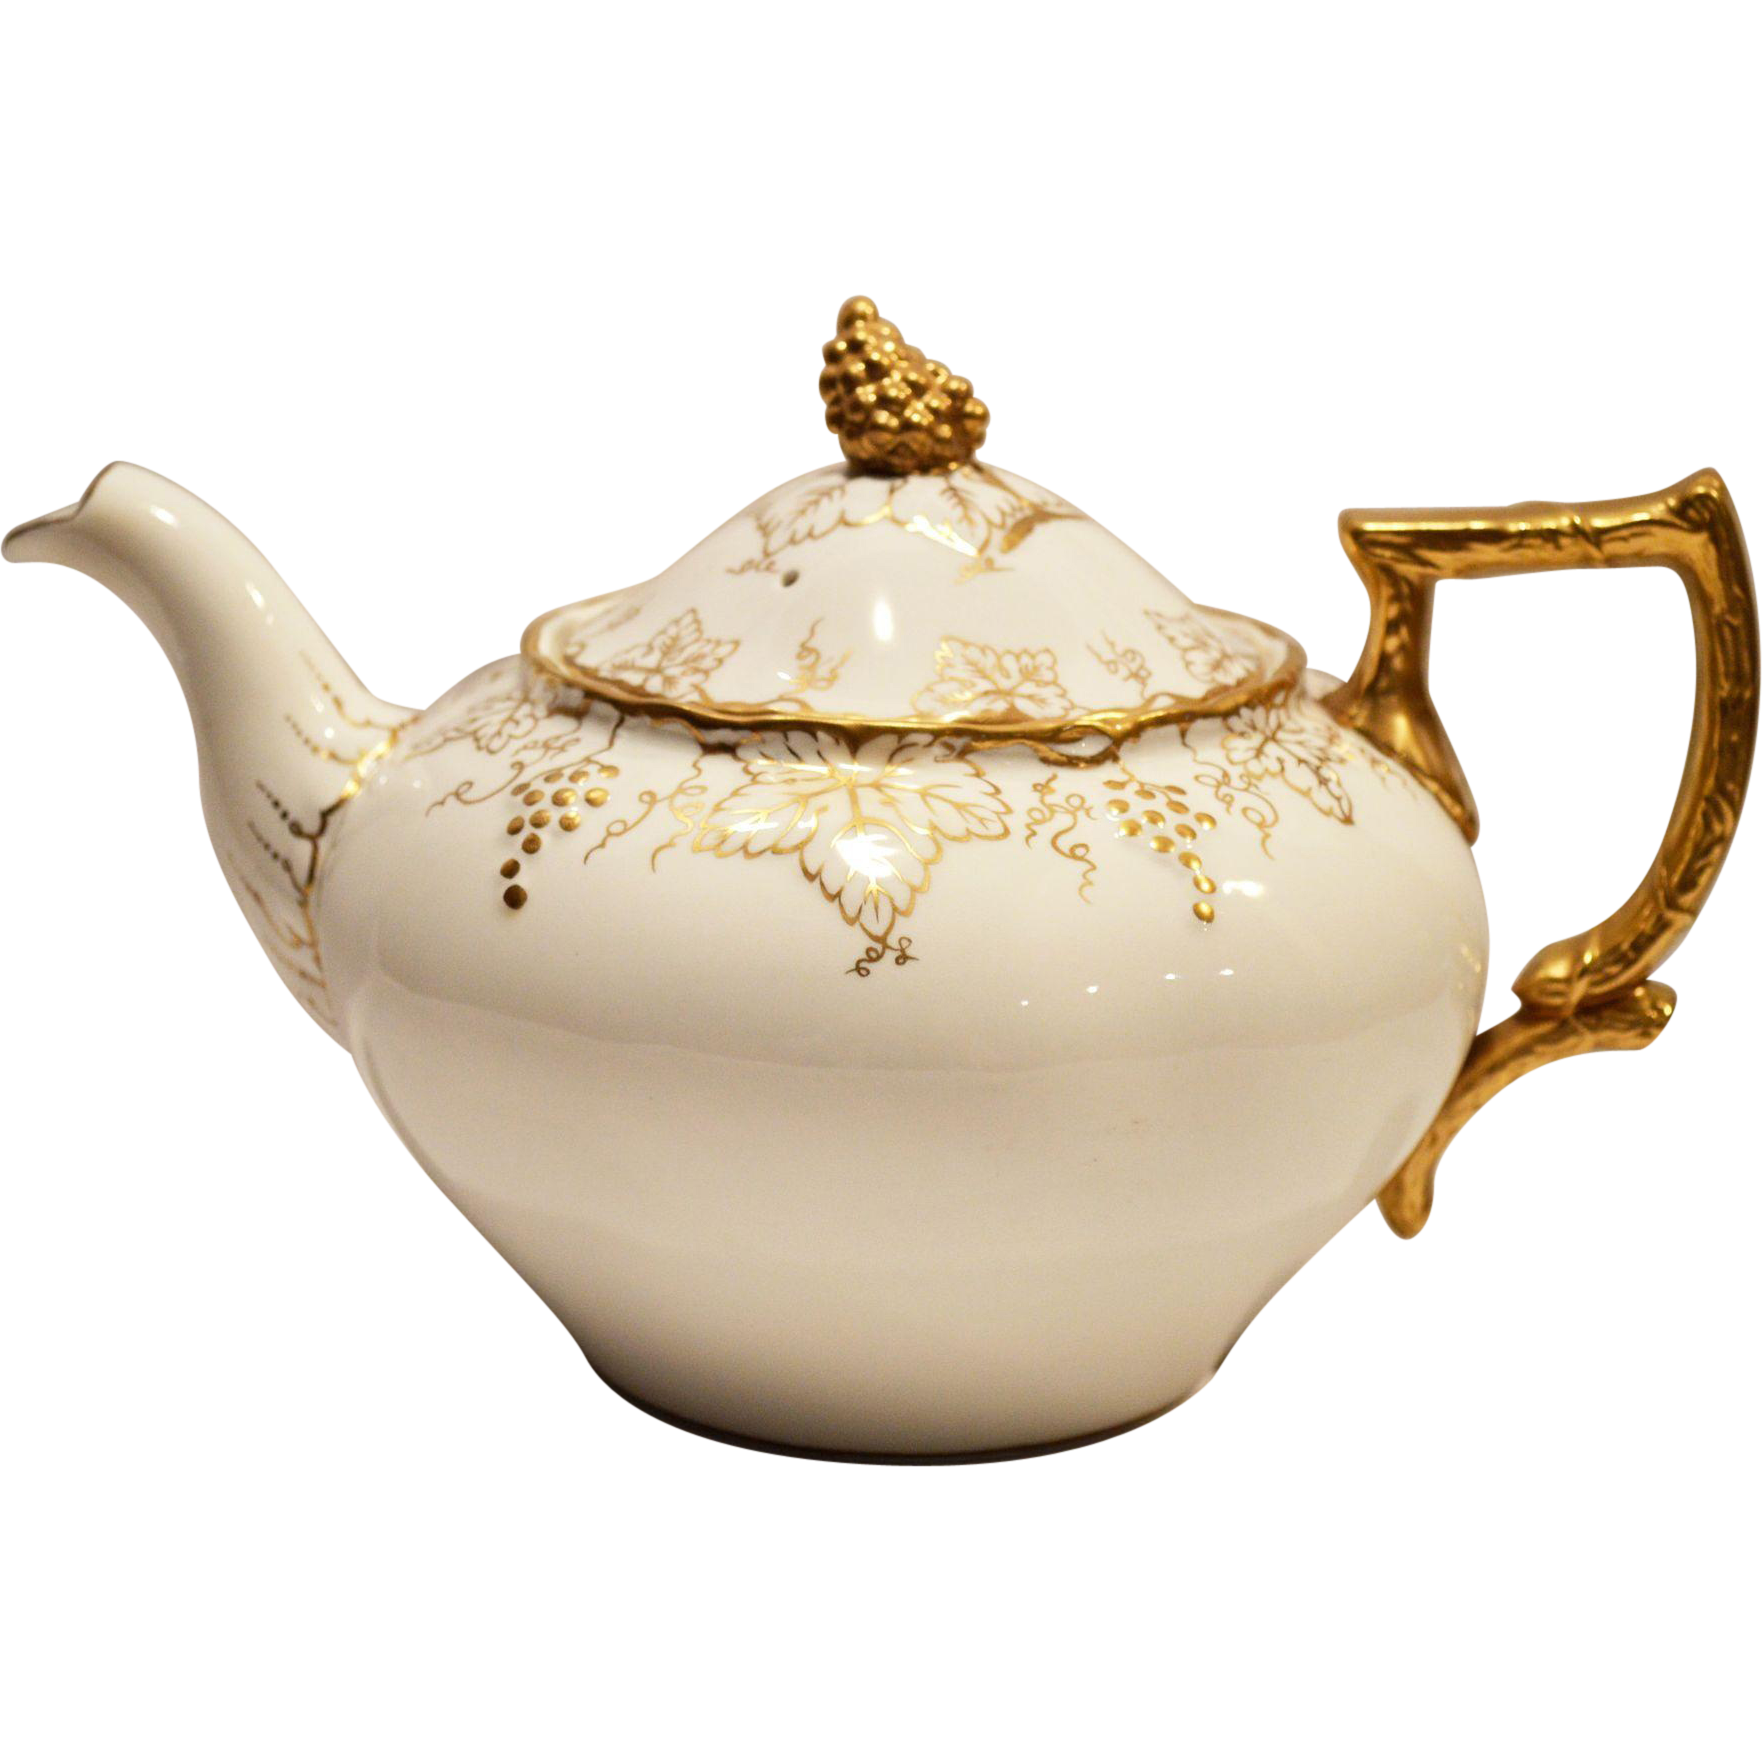 Teapot PNG Image Transparent Background.